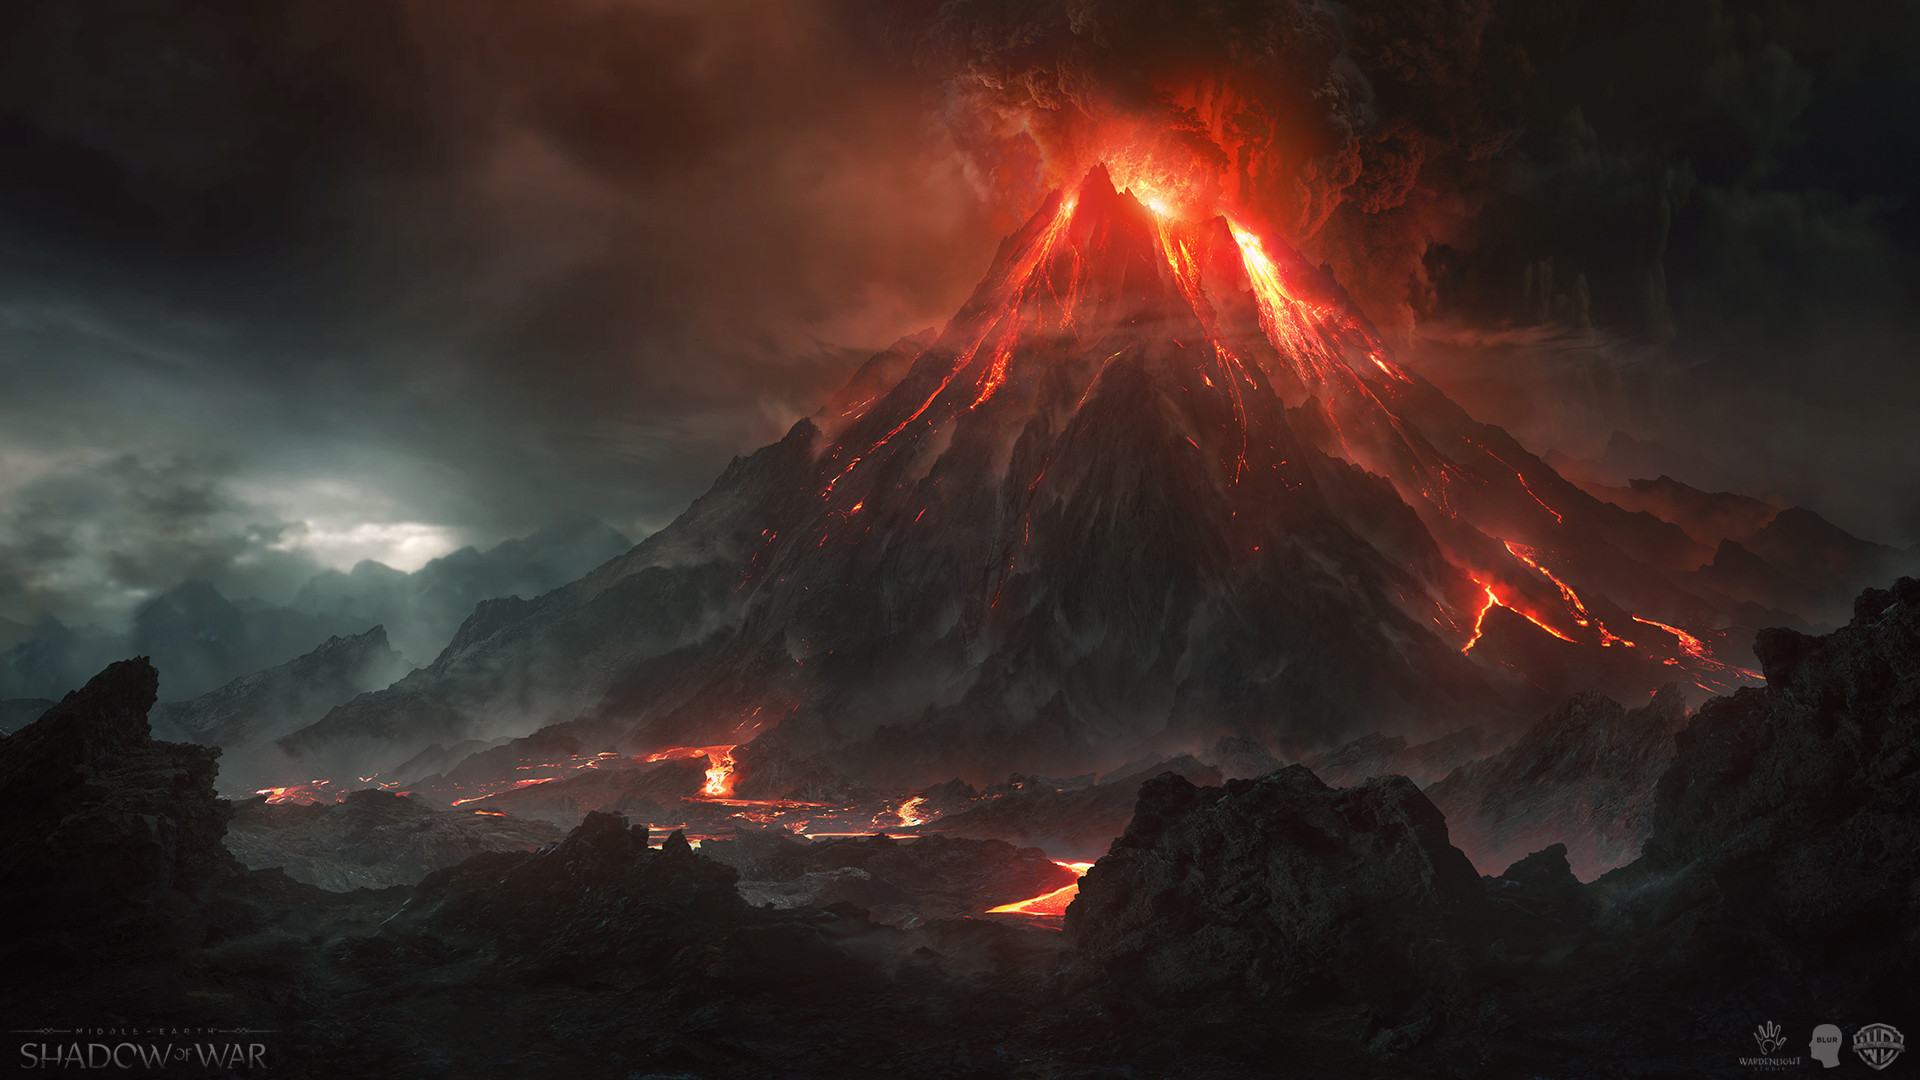 Wallpaper Hd Lord Of The Rings Wardenlight Studio Shadow Of War Cinematic Mount Doom